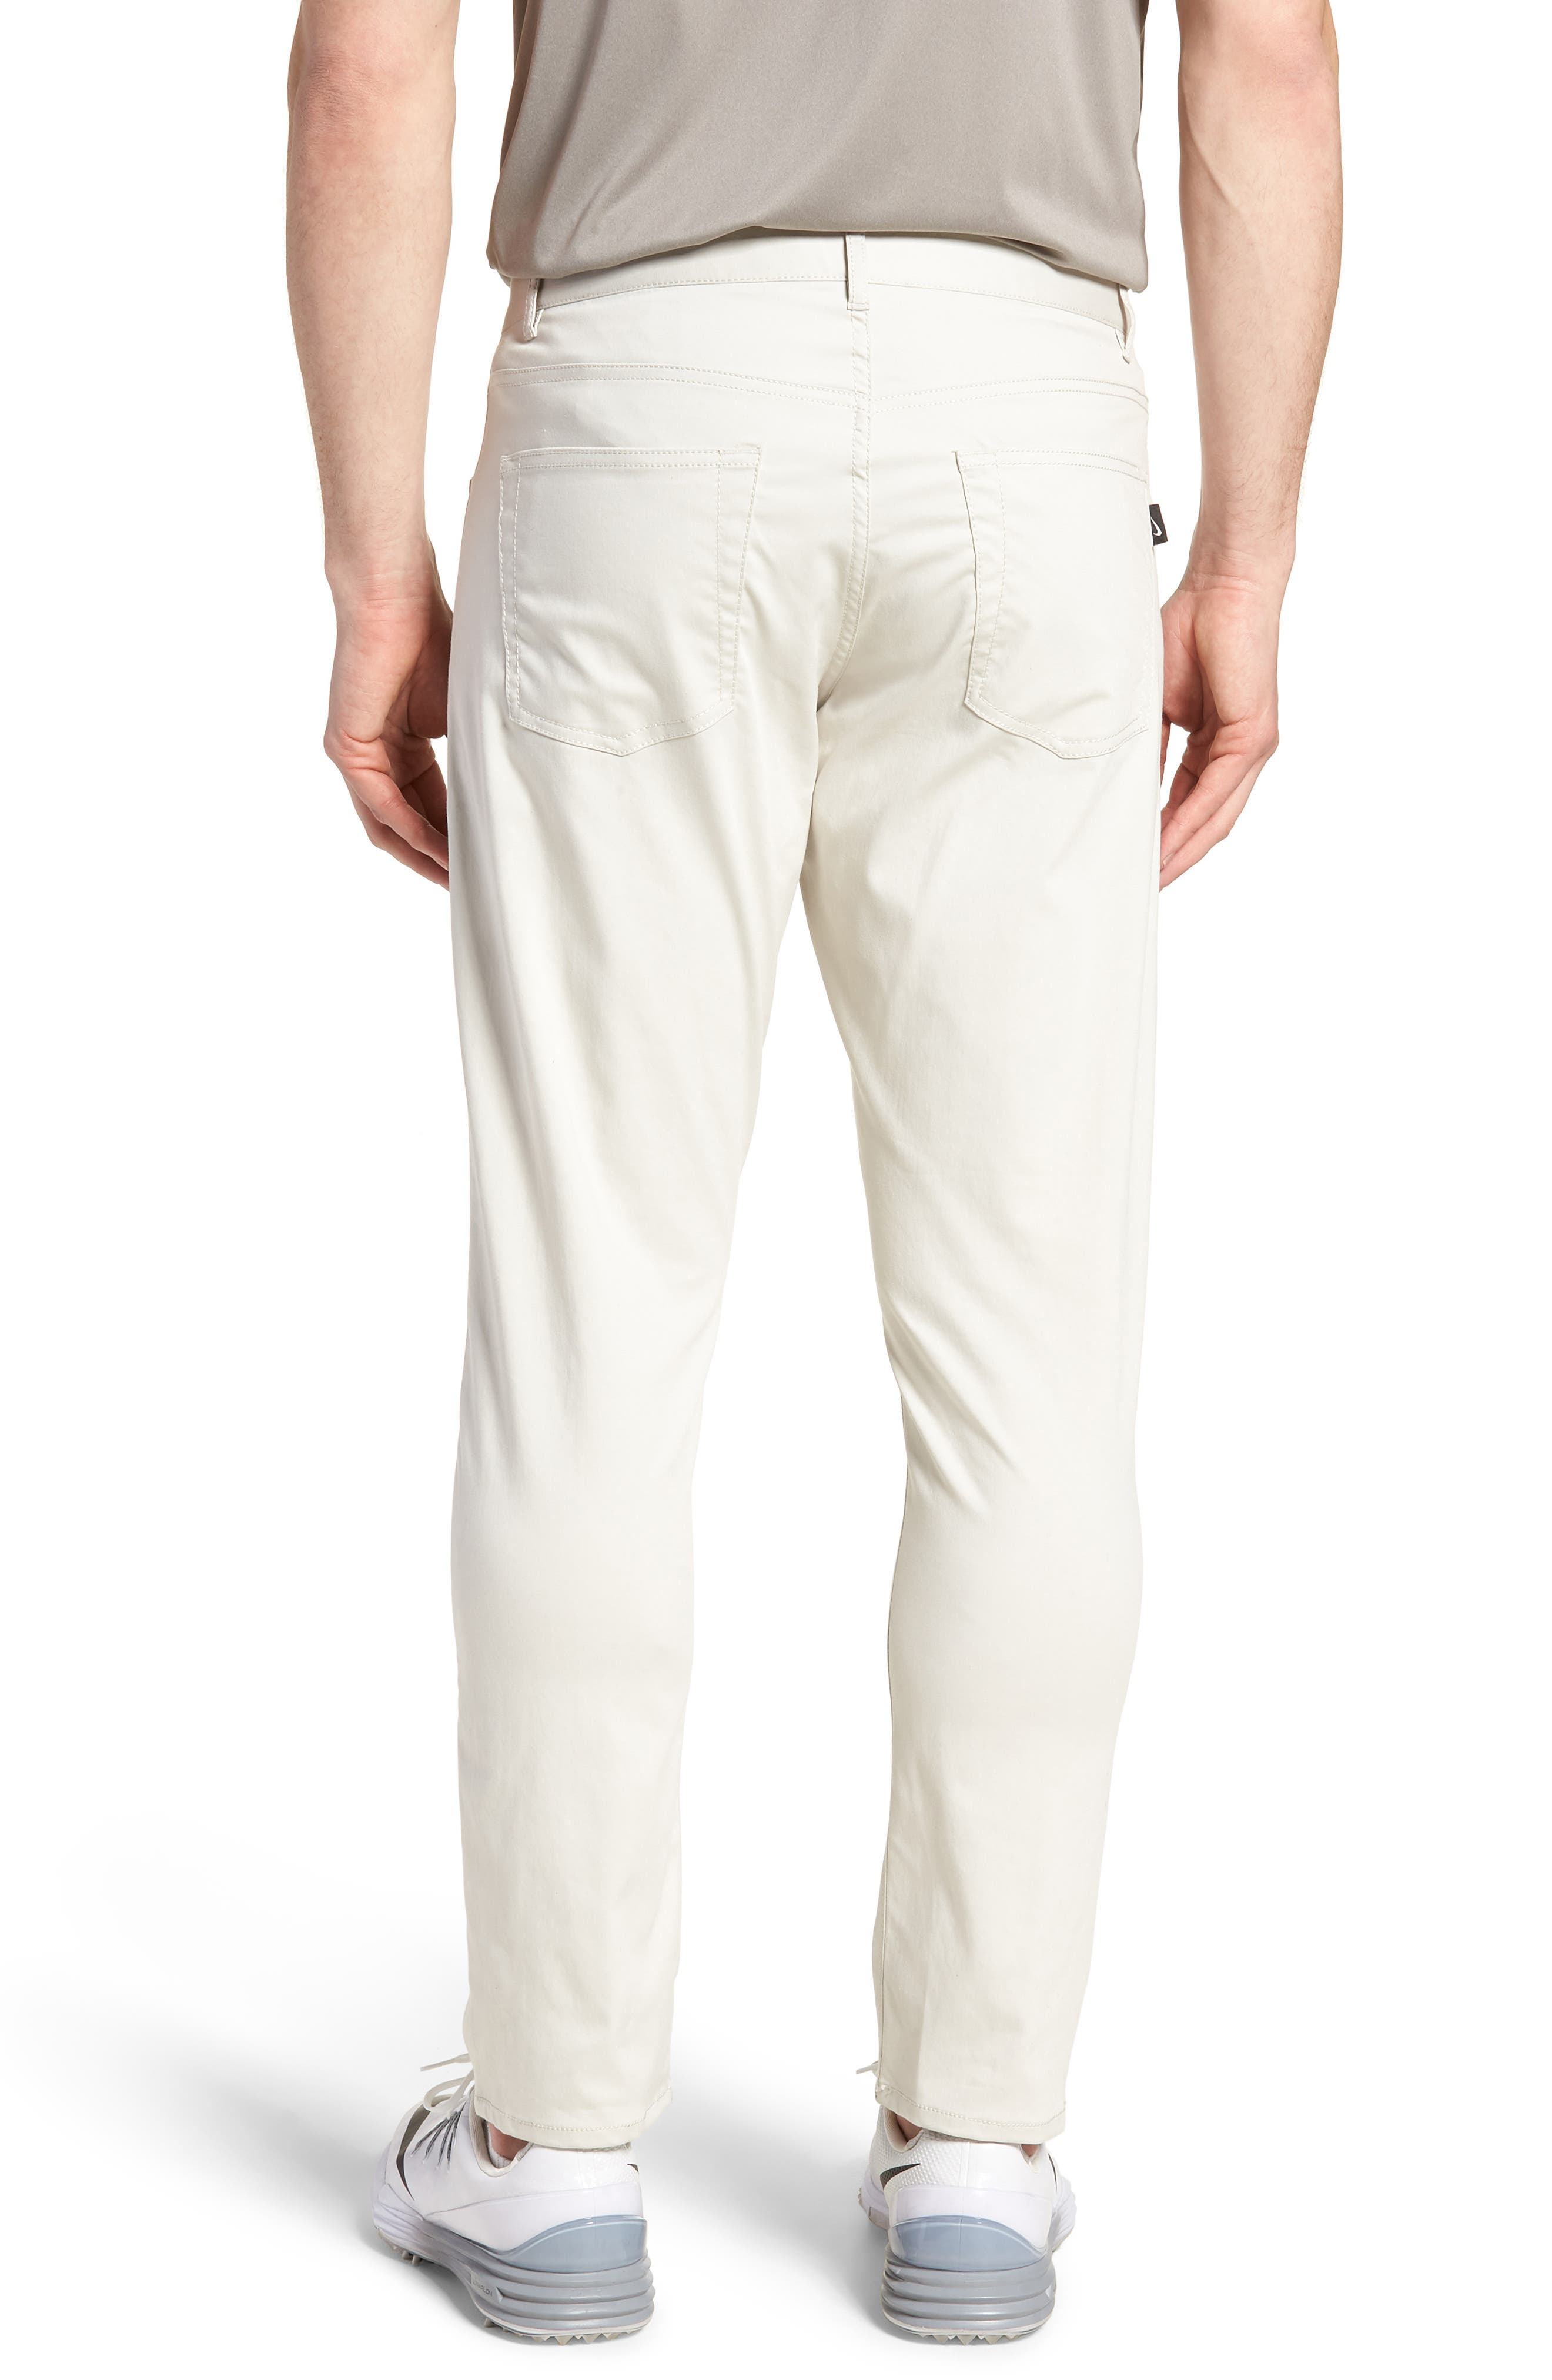 Dry Flex Slim Fit Golf Pants,                             Alternate thumbnail 2, color,                             LIGHT BONE/ WHITE